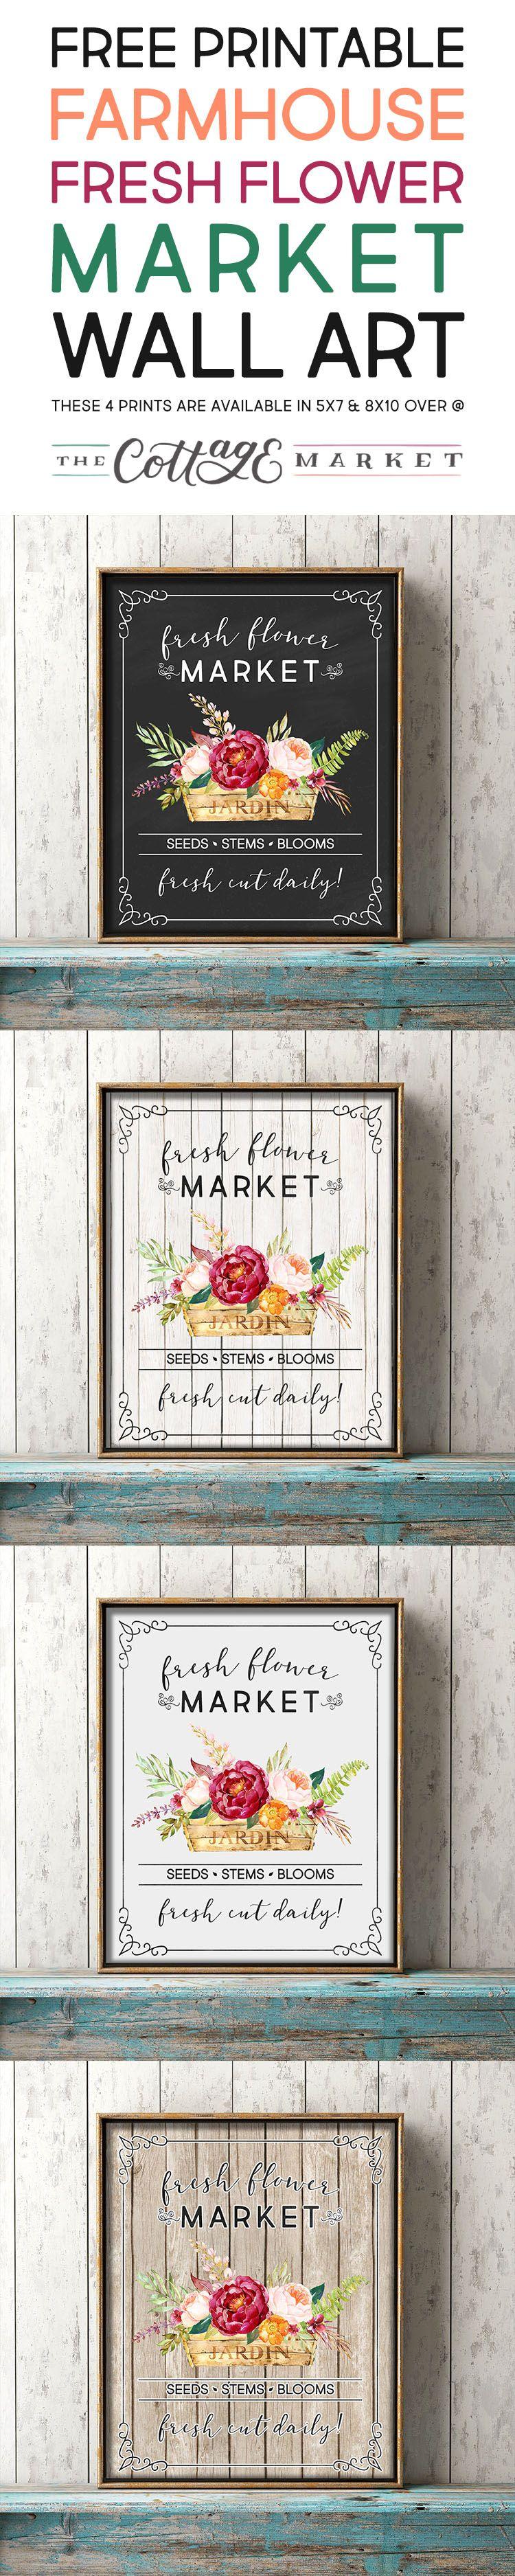 Free Printable Farmhouse Fresh Flower Market Wall Art /// 4